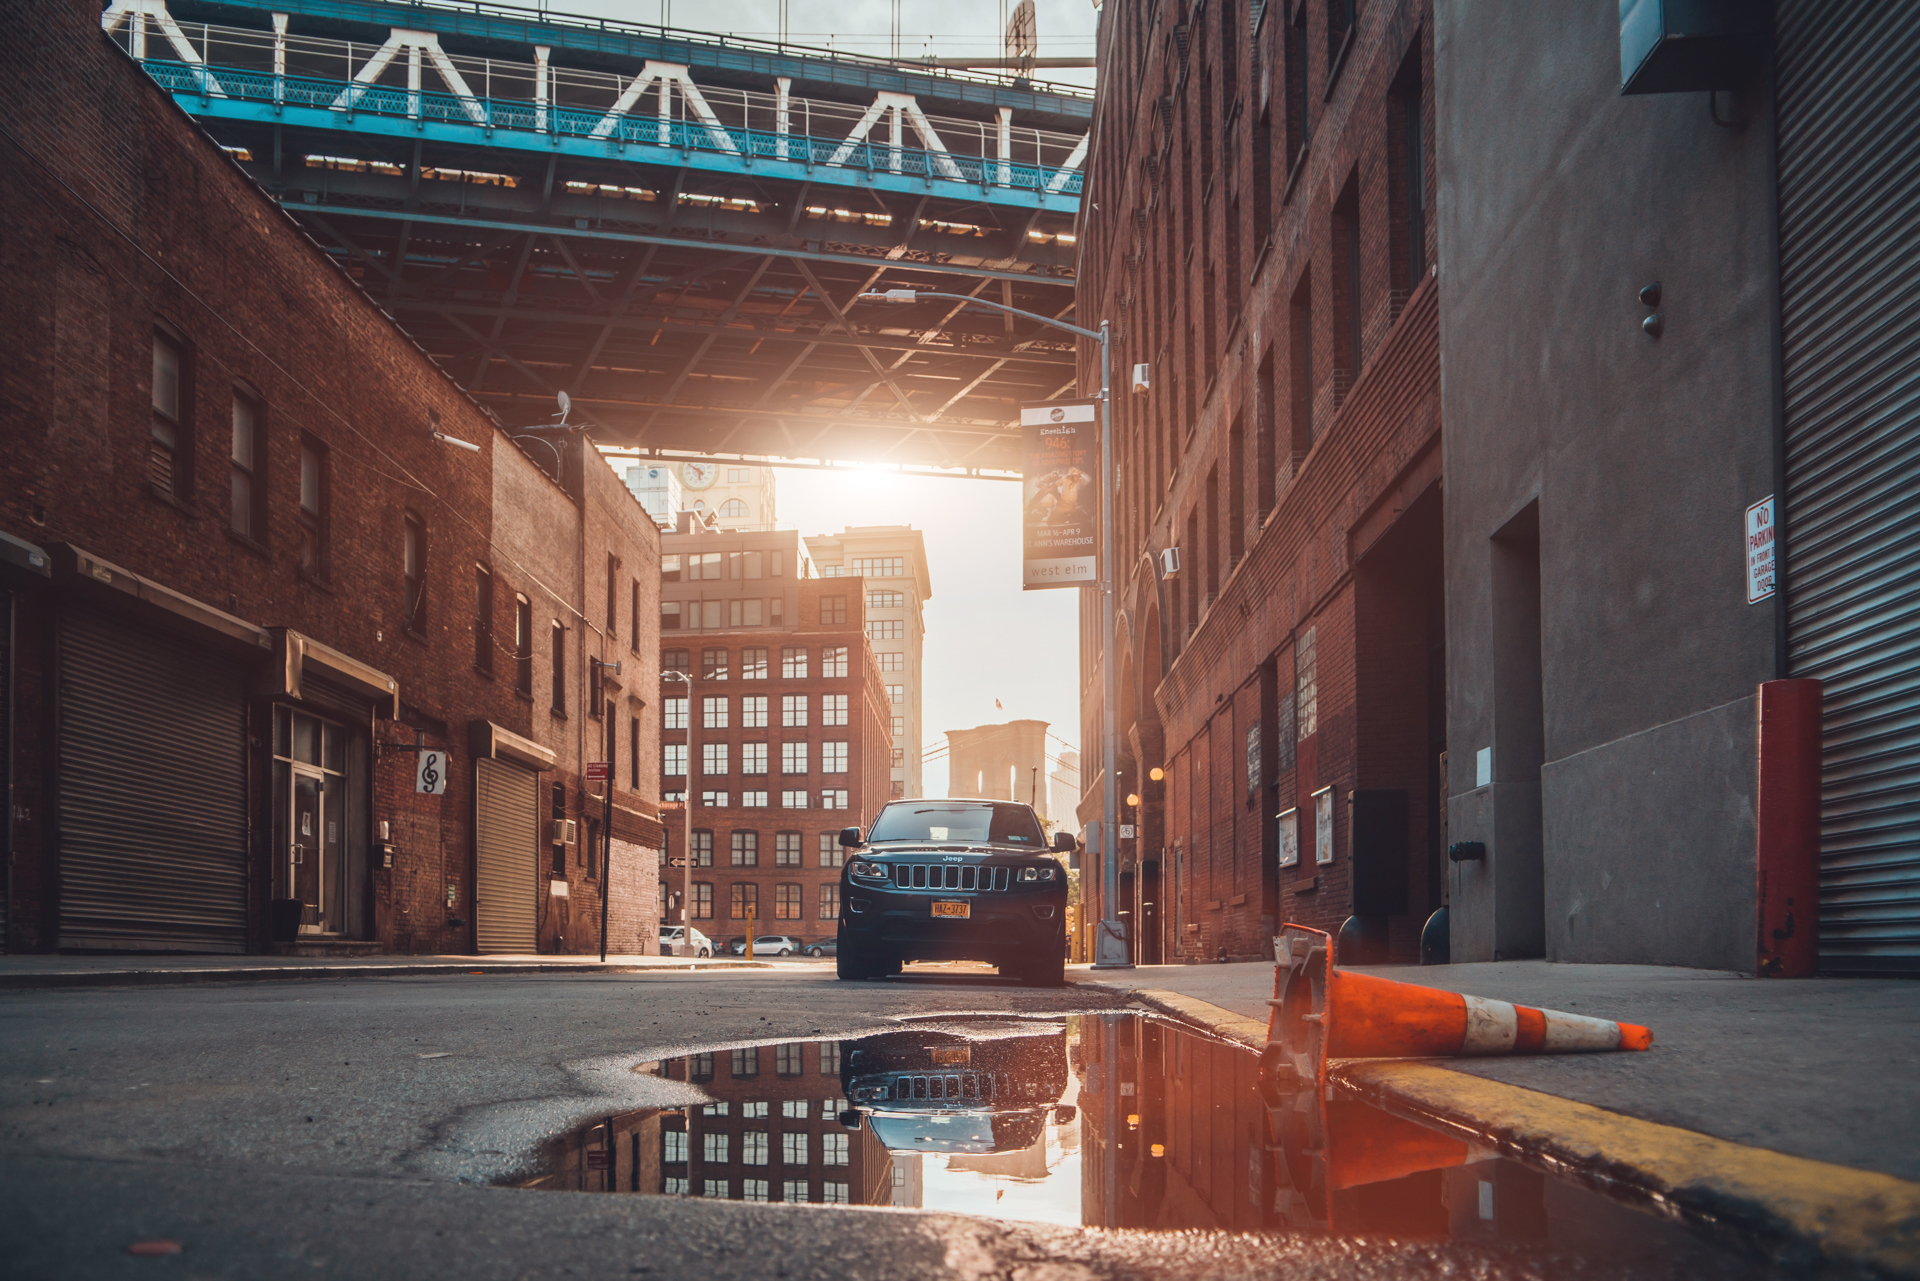 NYC_stijn_hoekstra-290.jpg